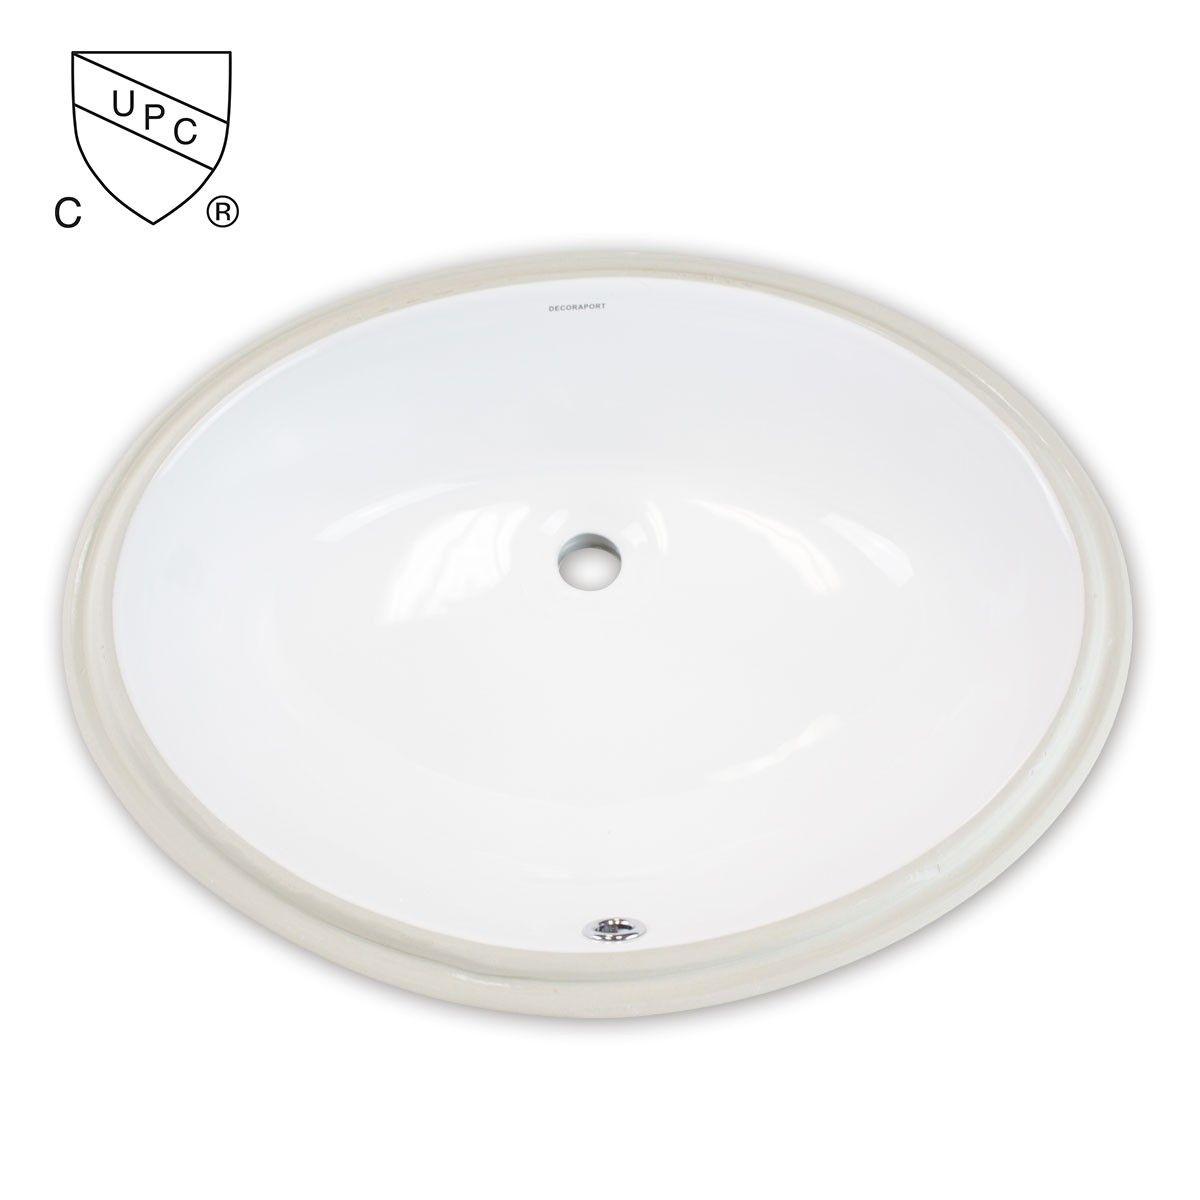 Decoraport White Oval Ceramic Under Mount Basin Bathroom Sink (MY-3708)